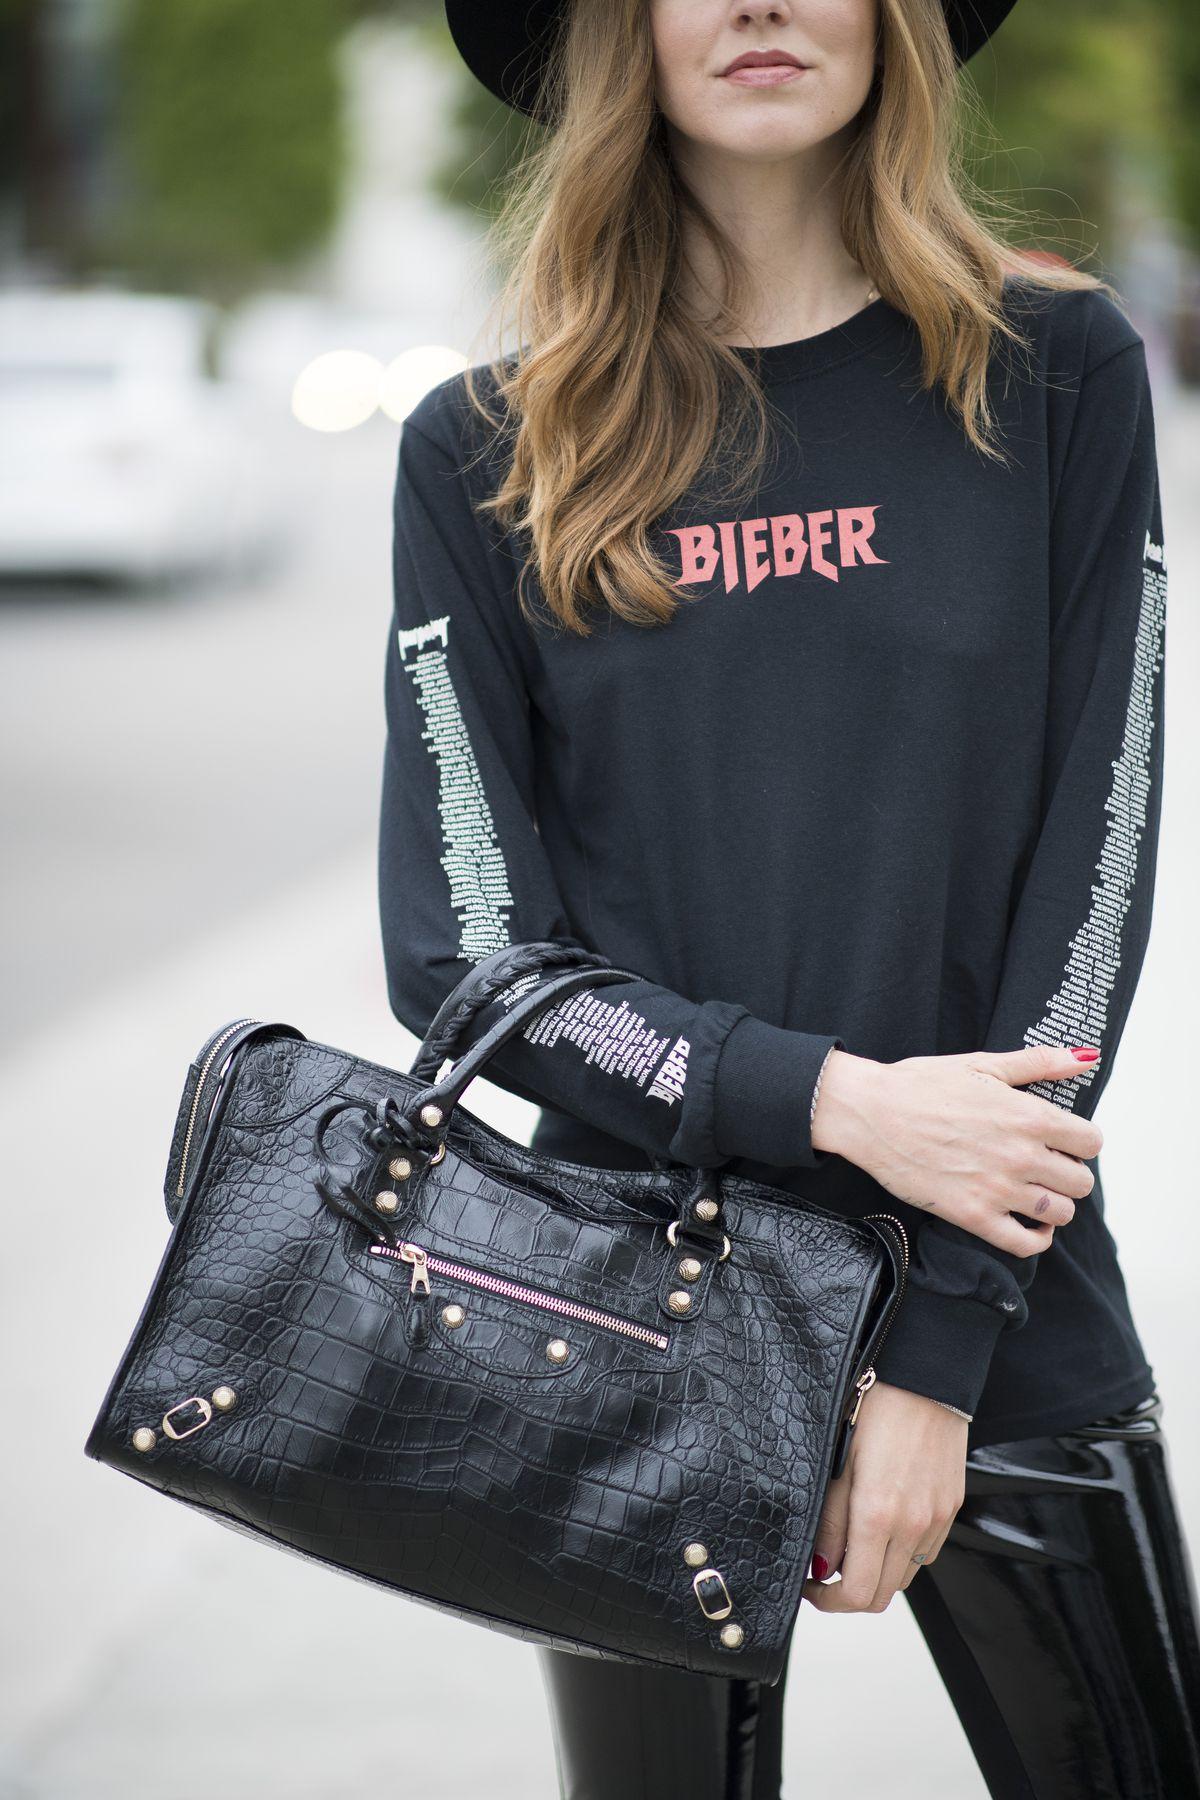 A woman in a black Justin Bieber tour shirt.